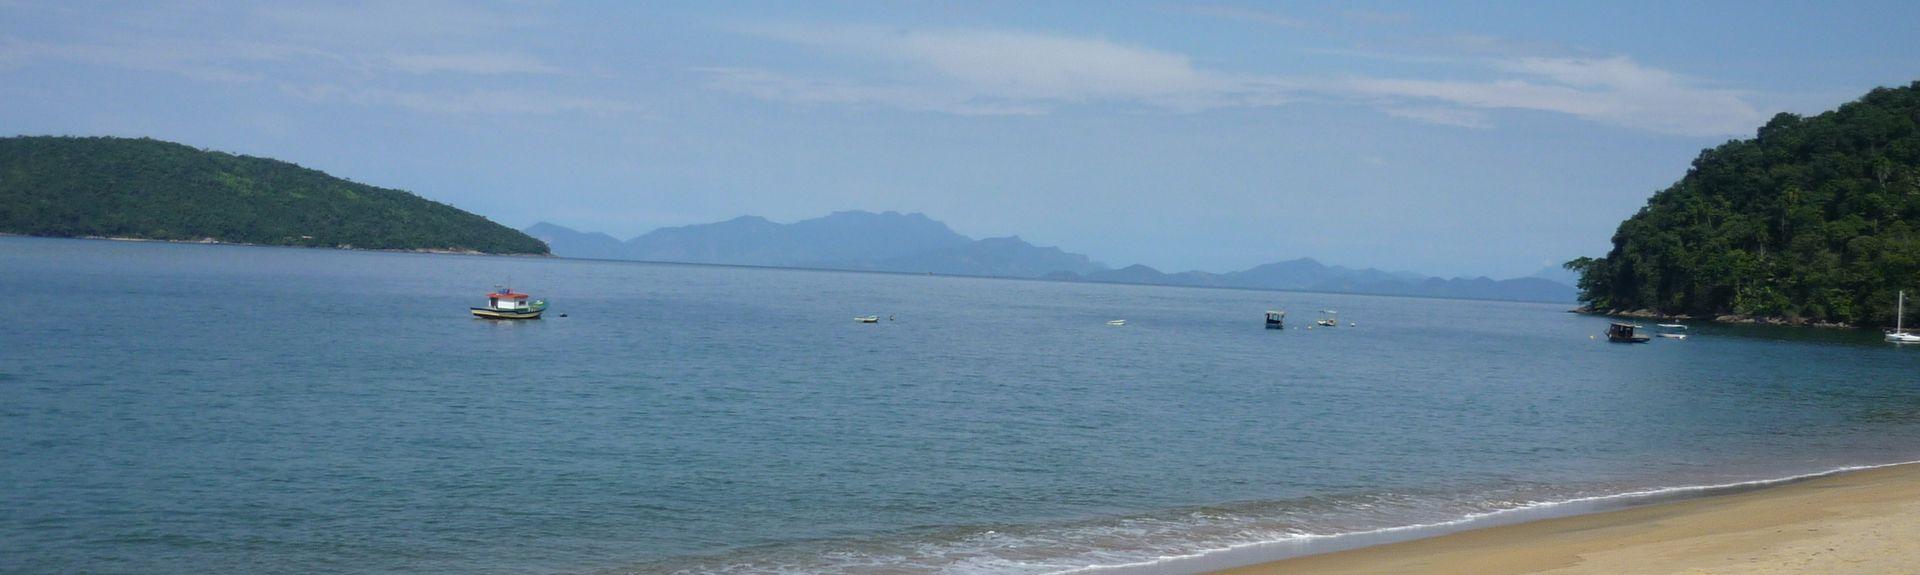 Praia Vermelha, Angra dos Reis, Regio zuidoost, Brazilië